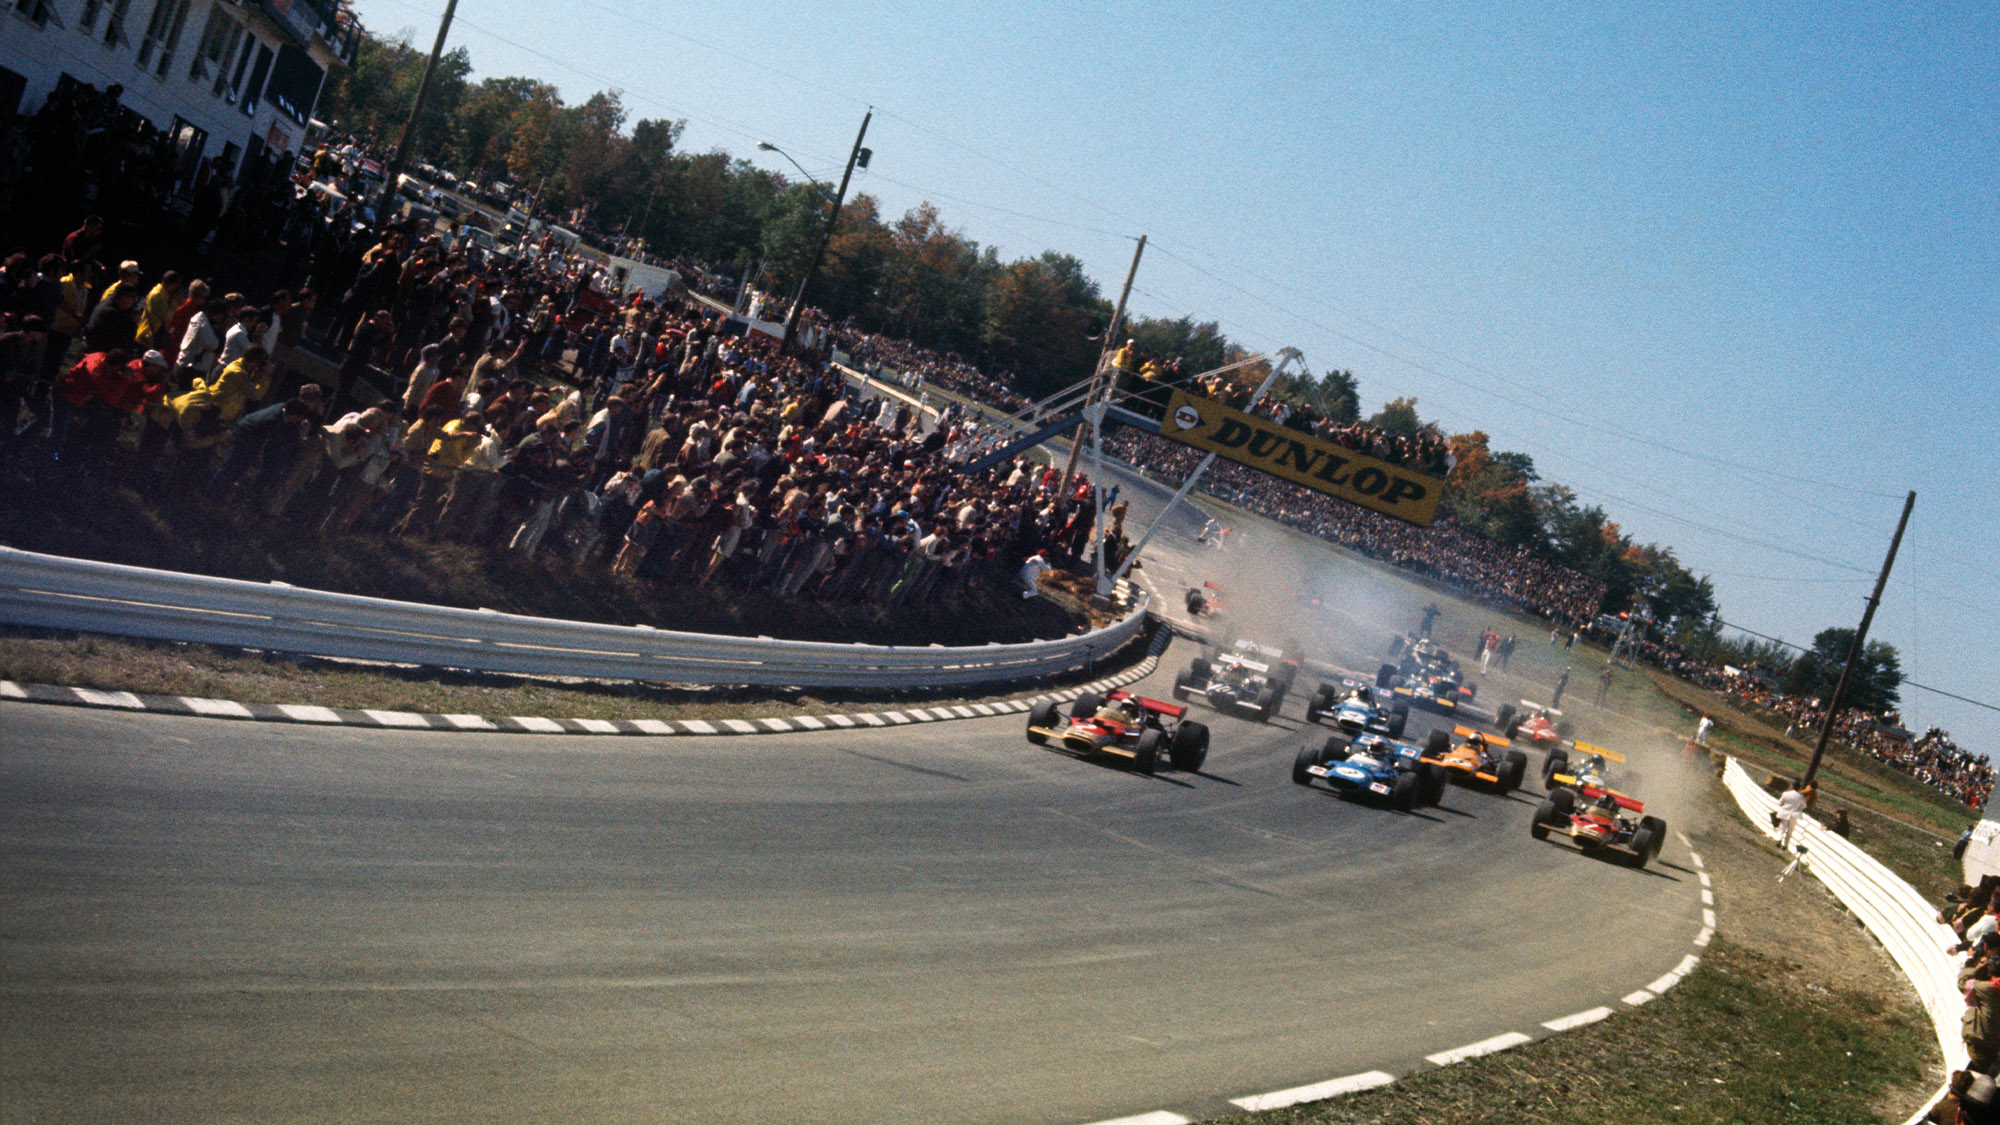 Start of the 1969 Watkins Glen Grand Prix